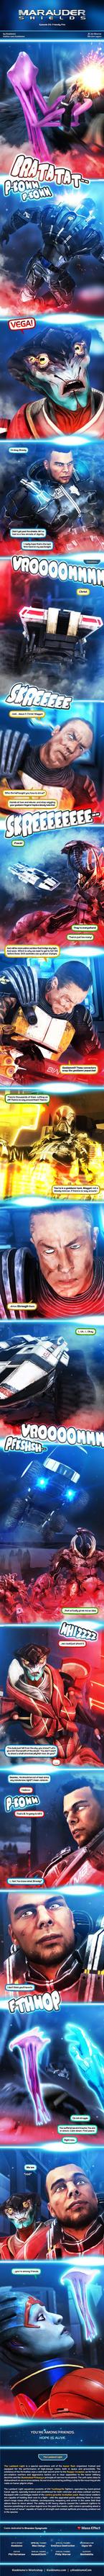 Marauder Shields 55: Friendly Fire (Mass Effect 3) by koobismo